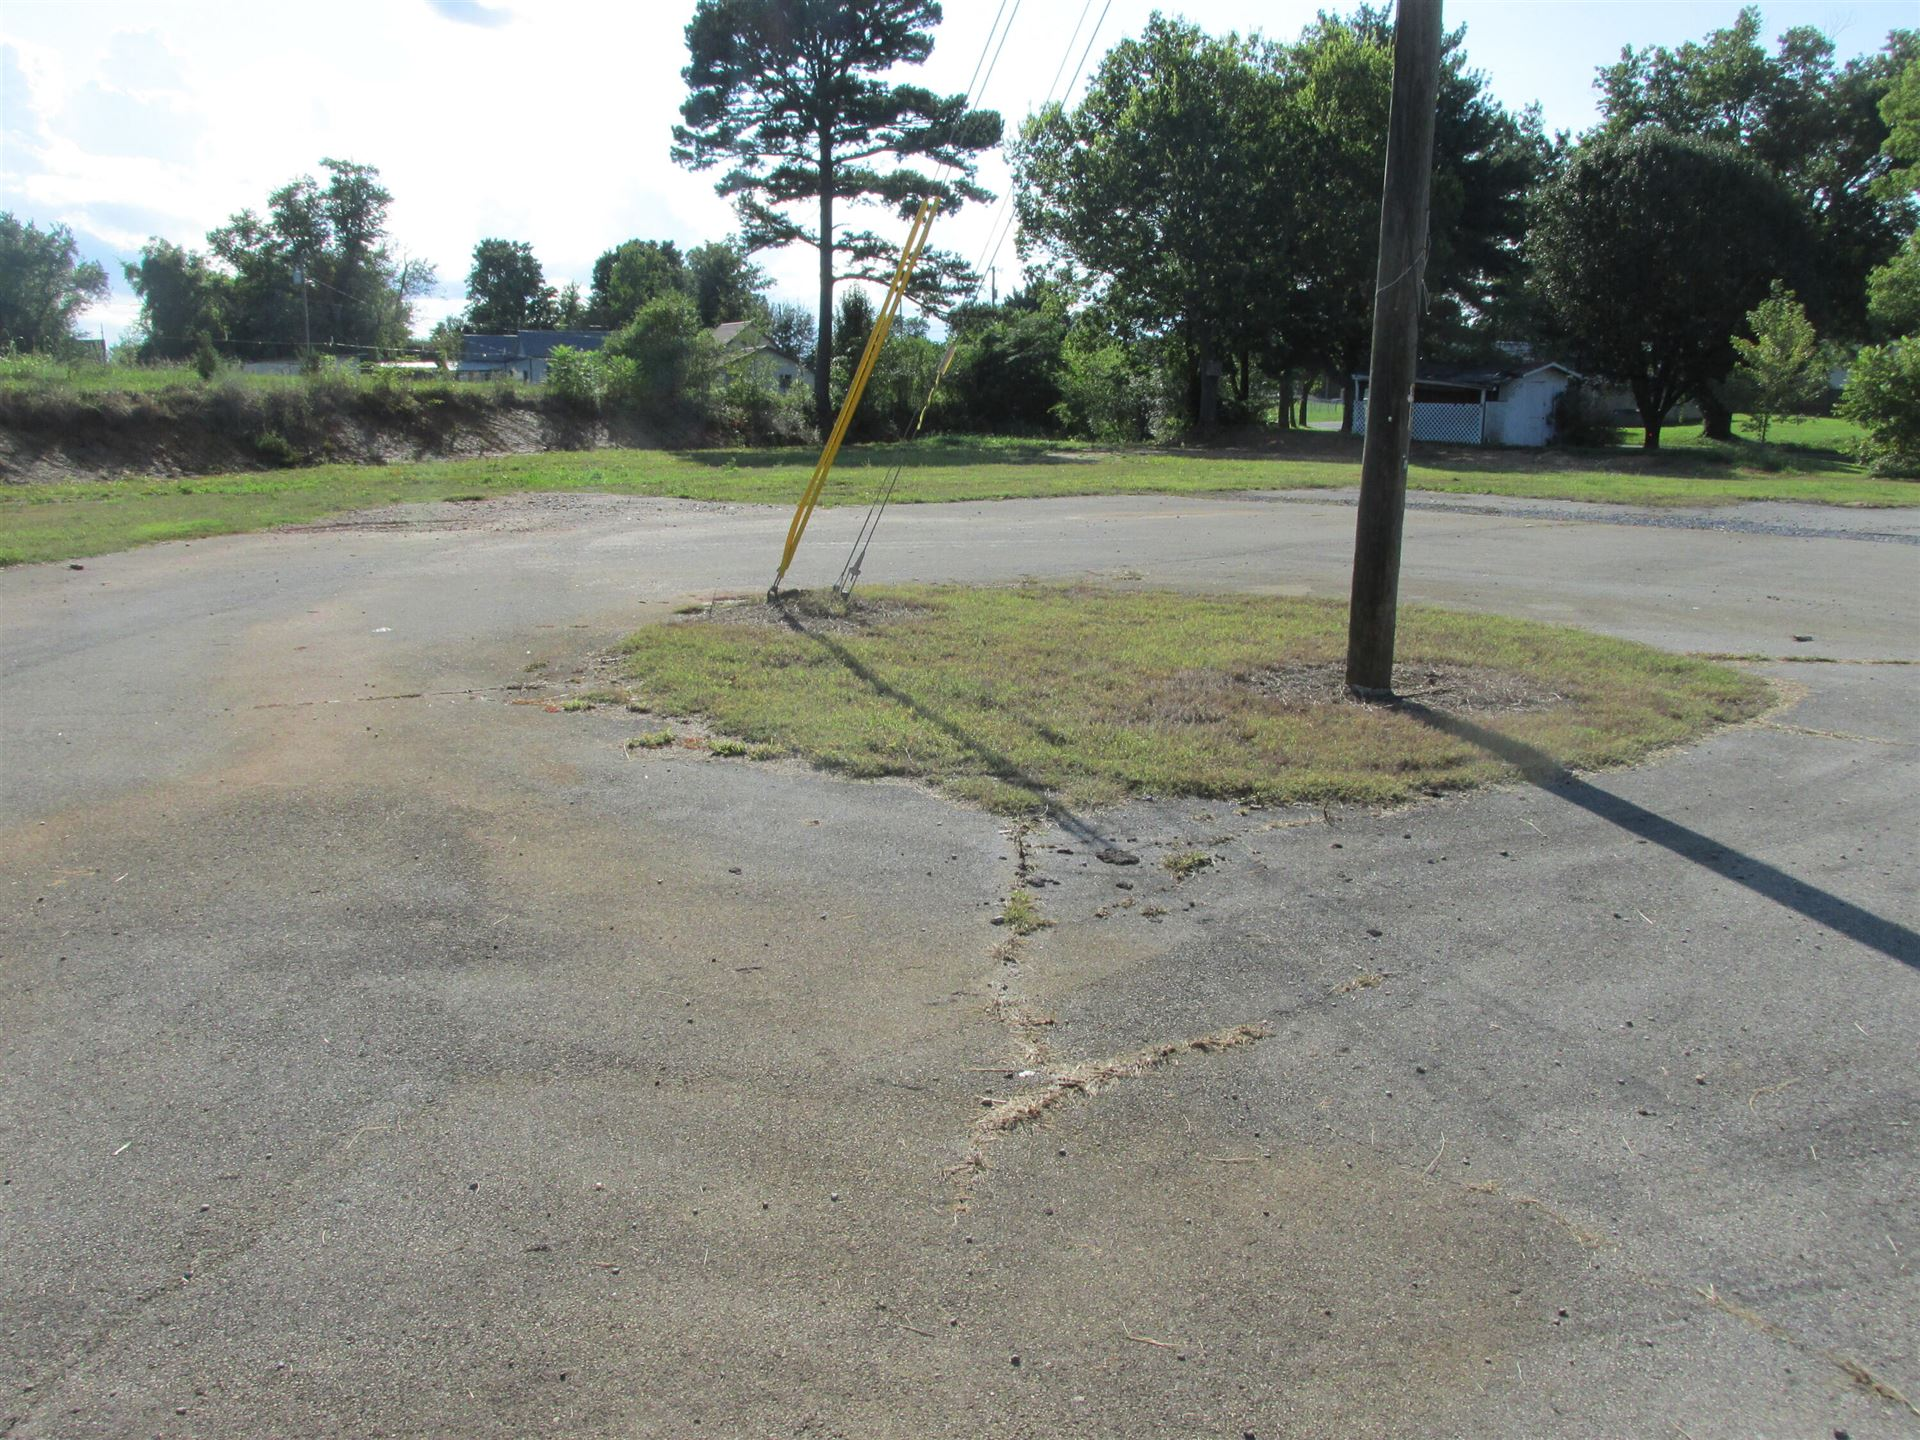 Photo of 650 Highway 95 S, Greenback, TN 37742 (MLS # 1164930)